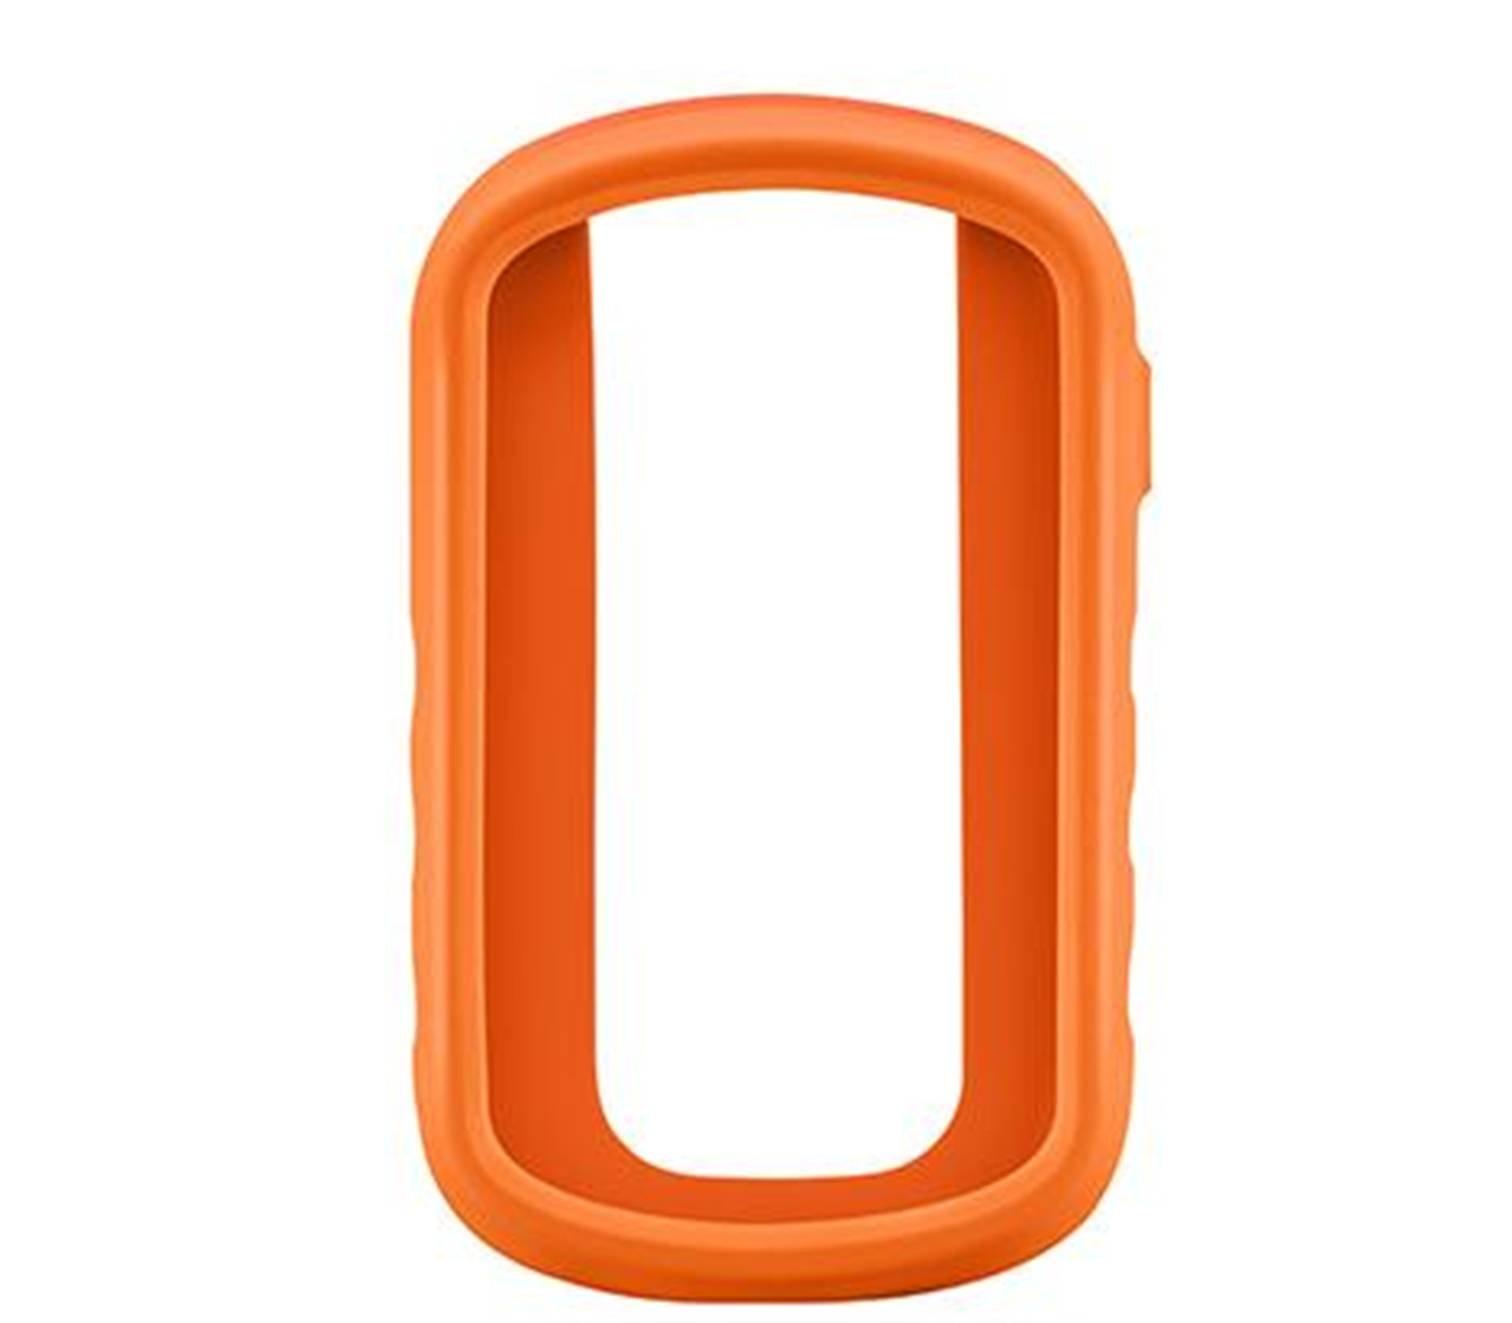 Garmin Silicone Case for eTrex Touch 25/35, Orange